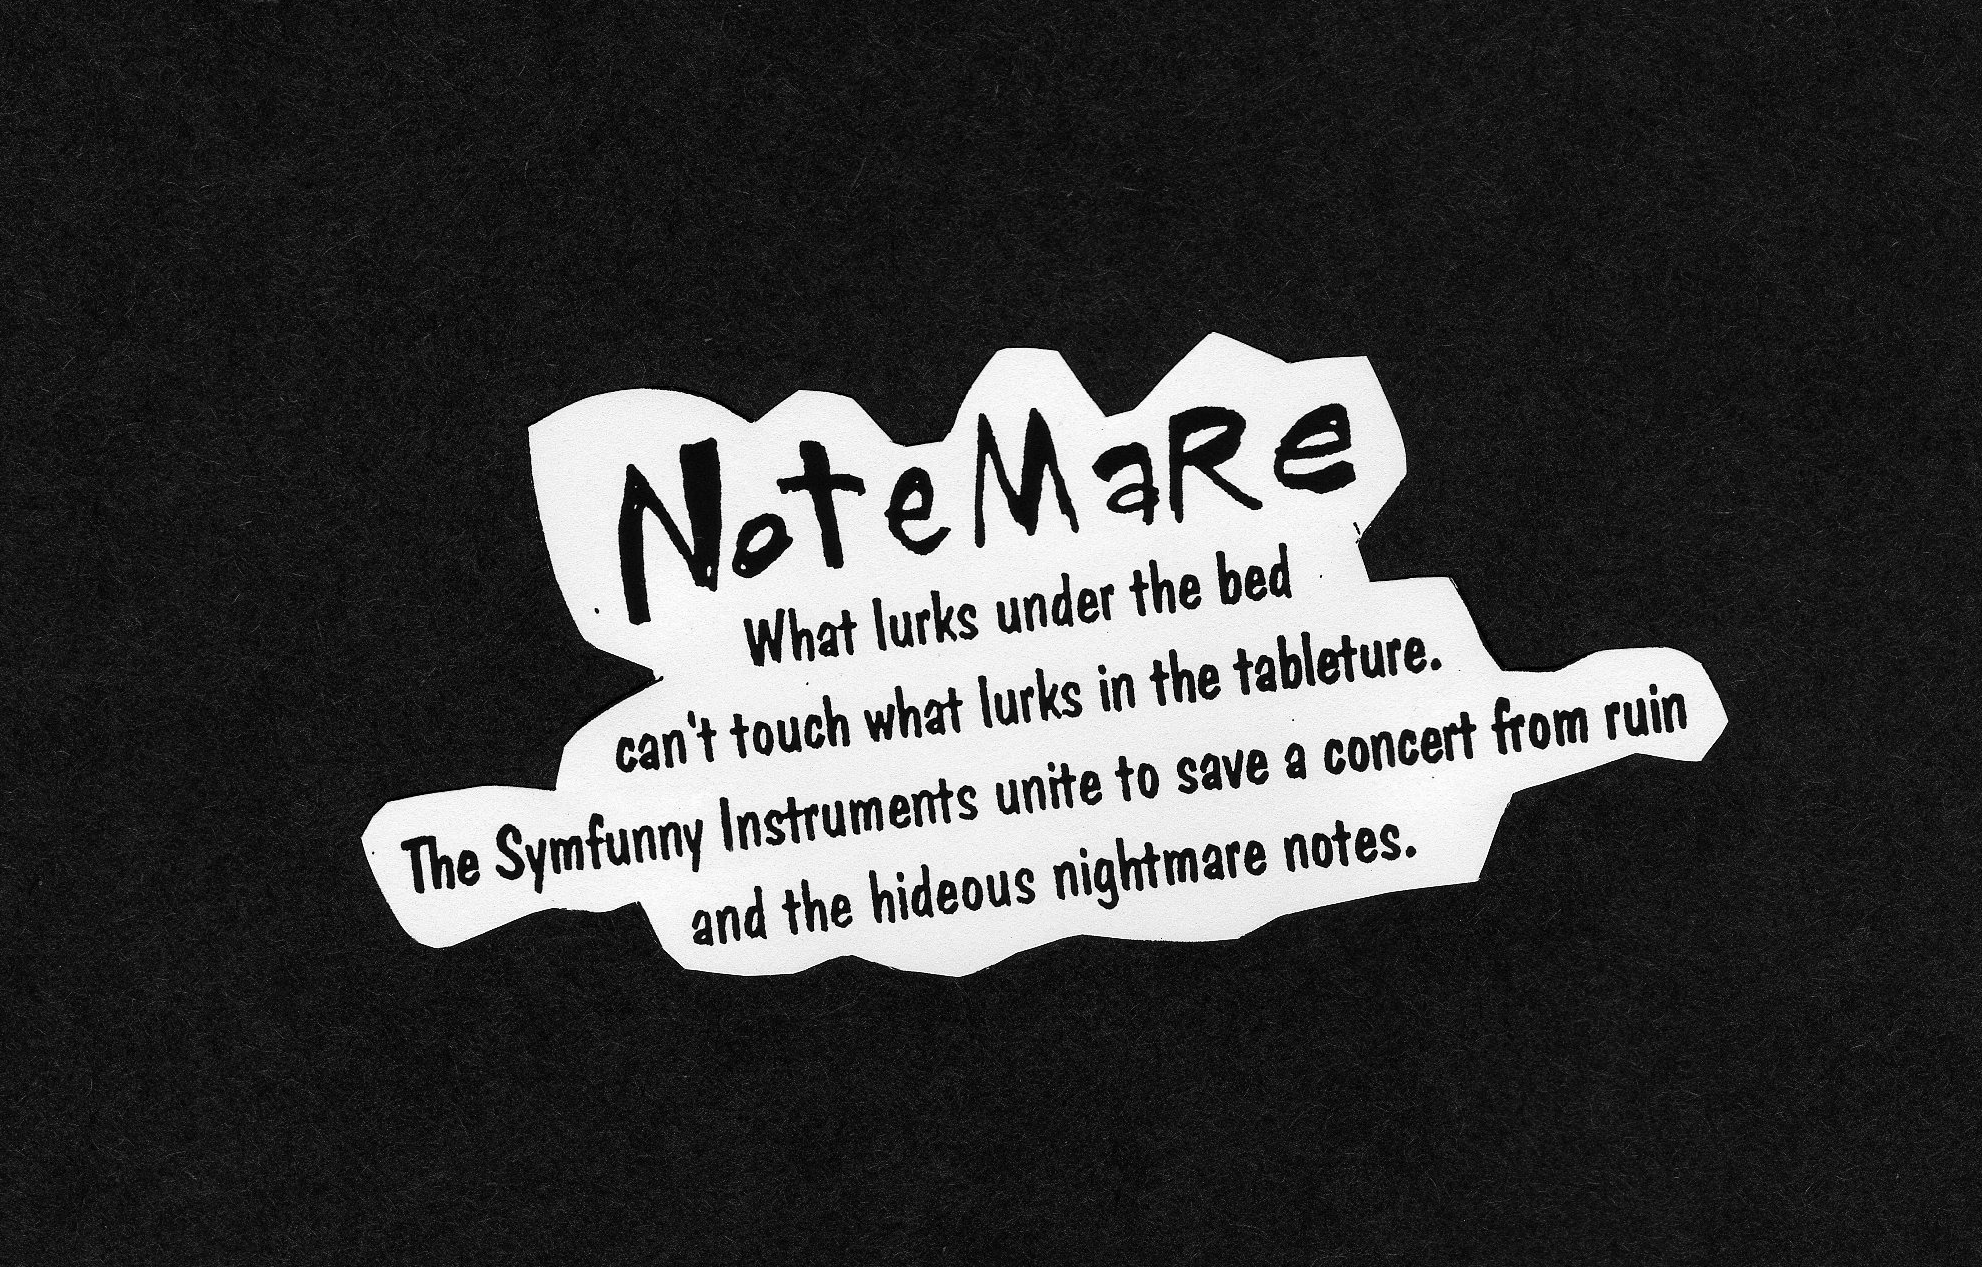 Notemare020.jpg